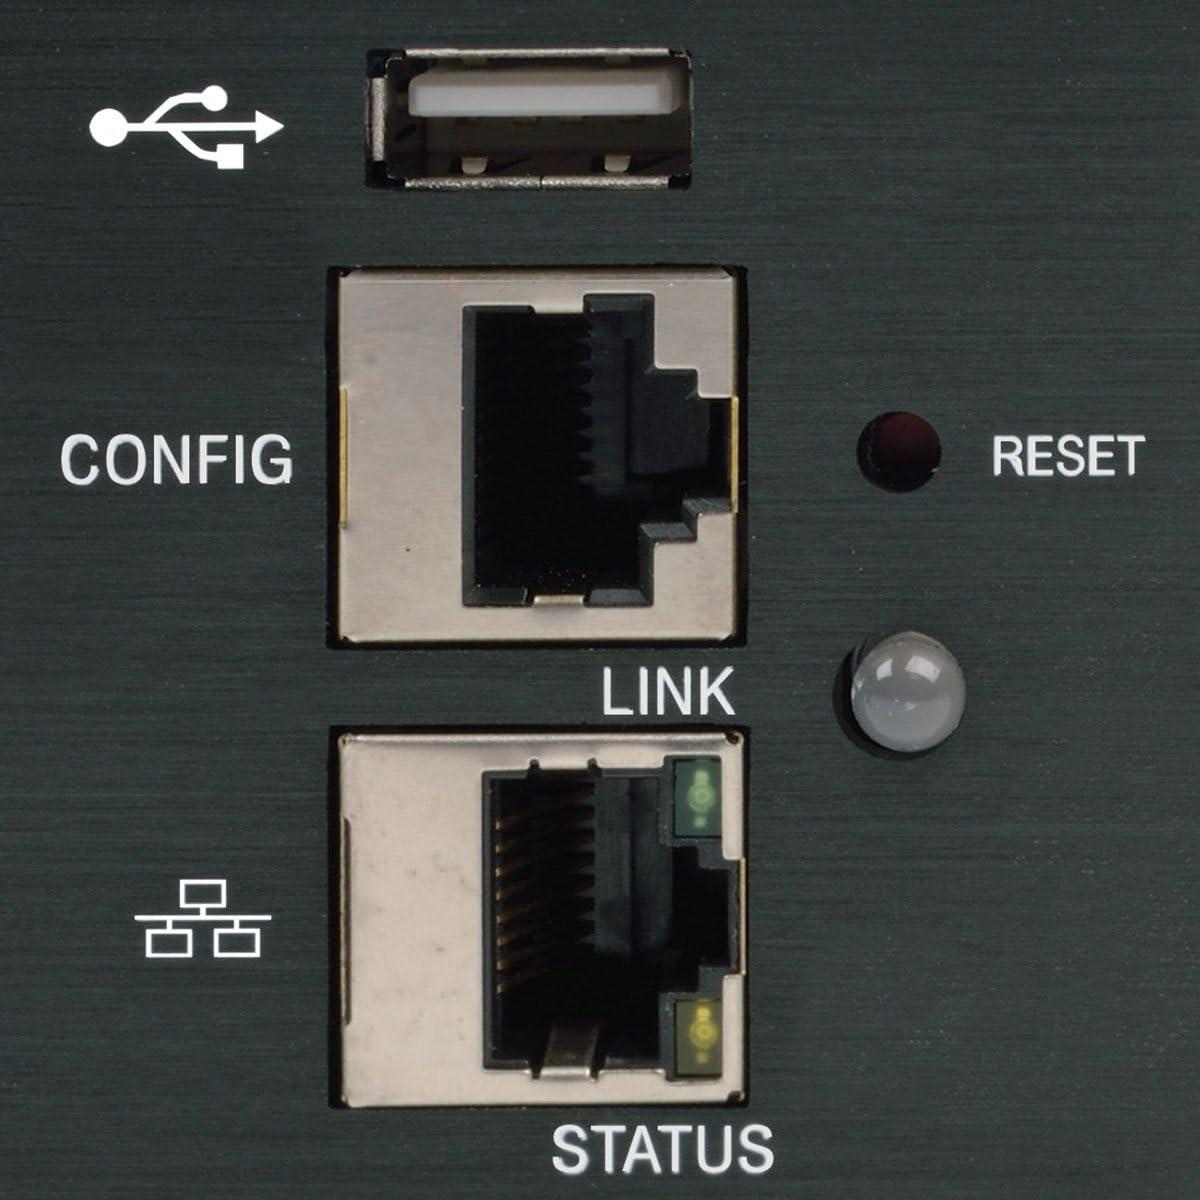 PDUMV30NETLX Tripp Lite PDU Switched 2.9kW 120V 24 5-15//20R 30A L5-30P LX Platform Interface Vertical 0URM Rack-Mount TAA